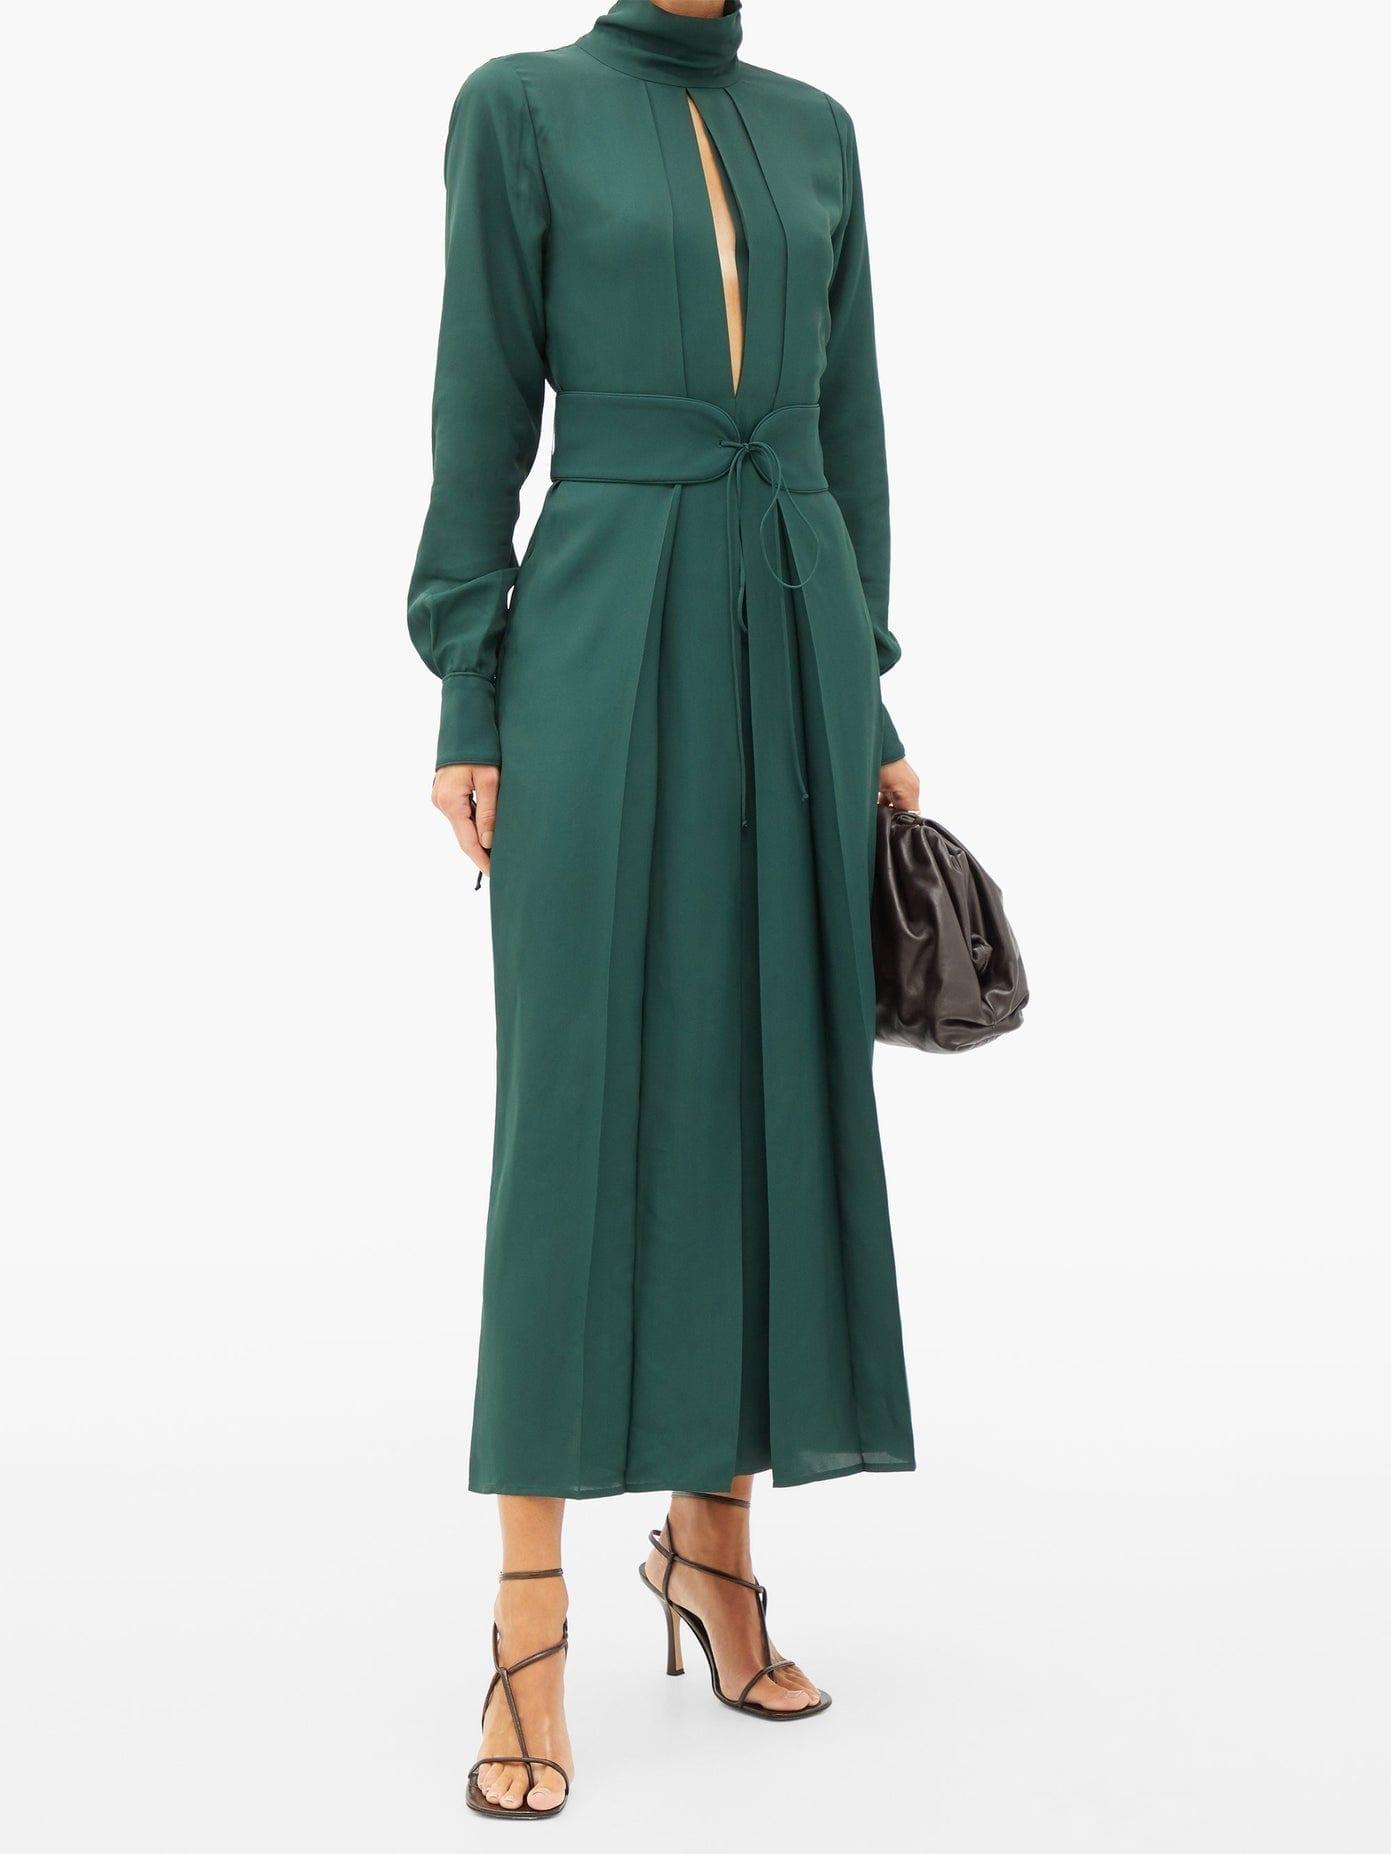 VICTORIA BECKHAM Front-slit Belted Satin-twill Dress